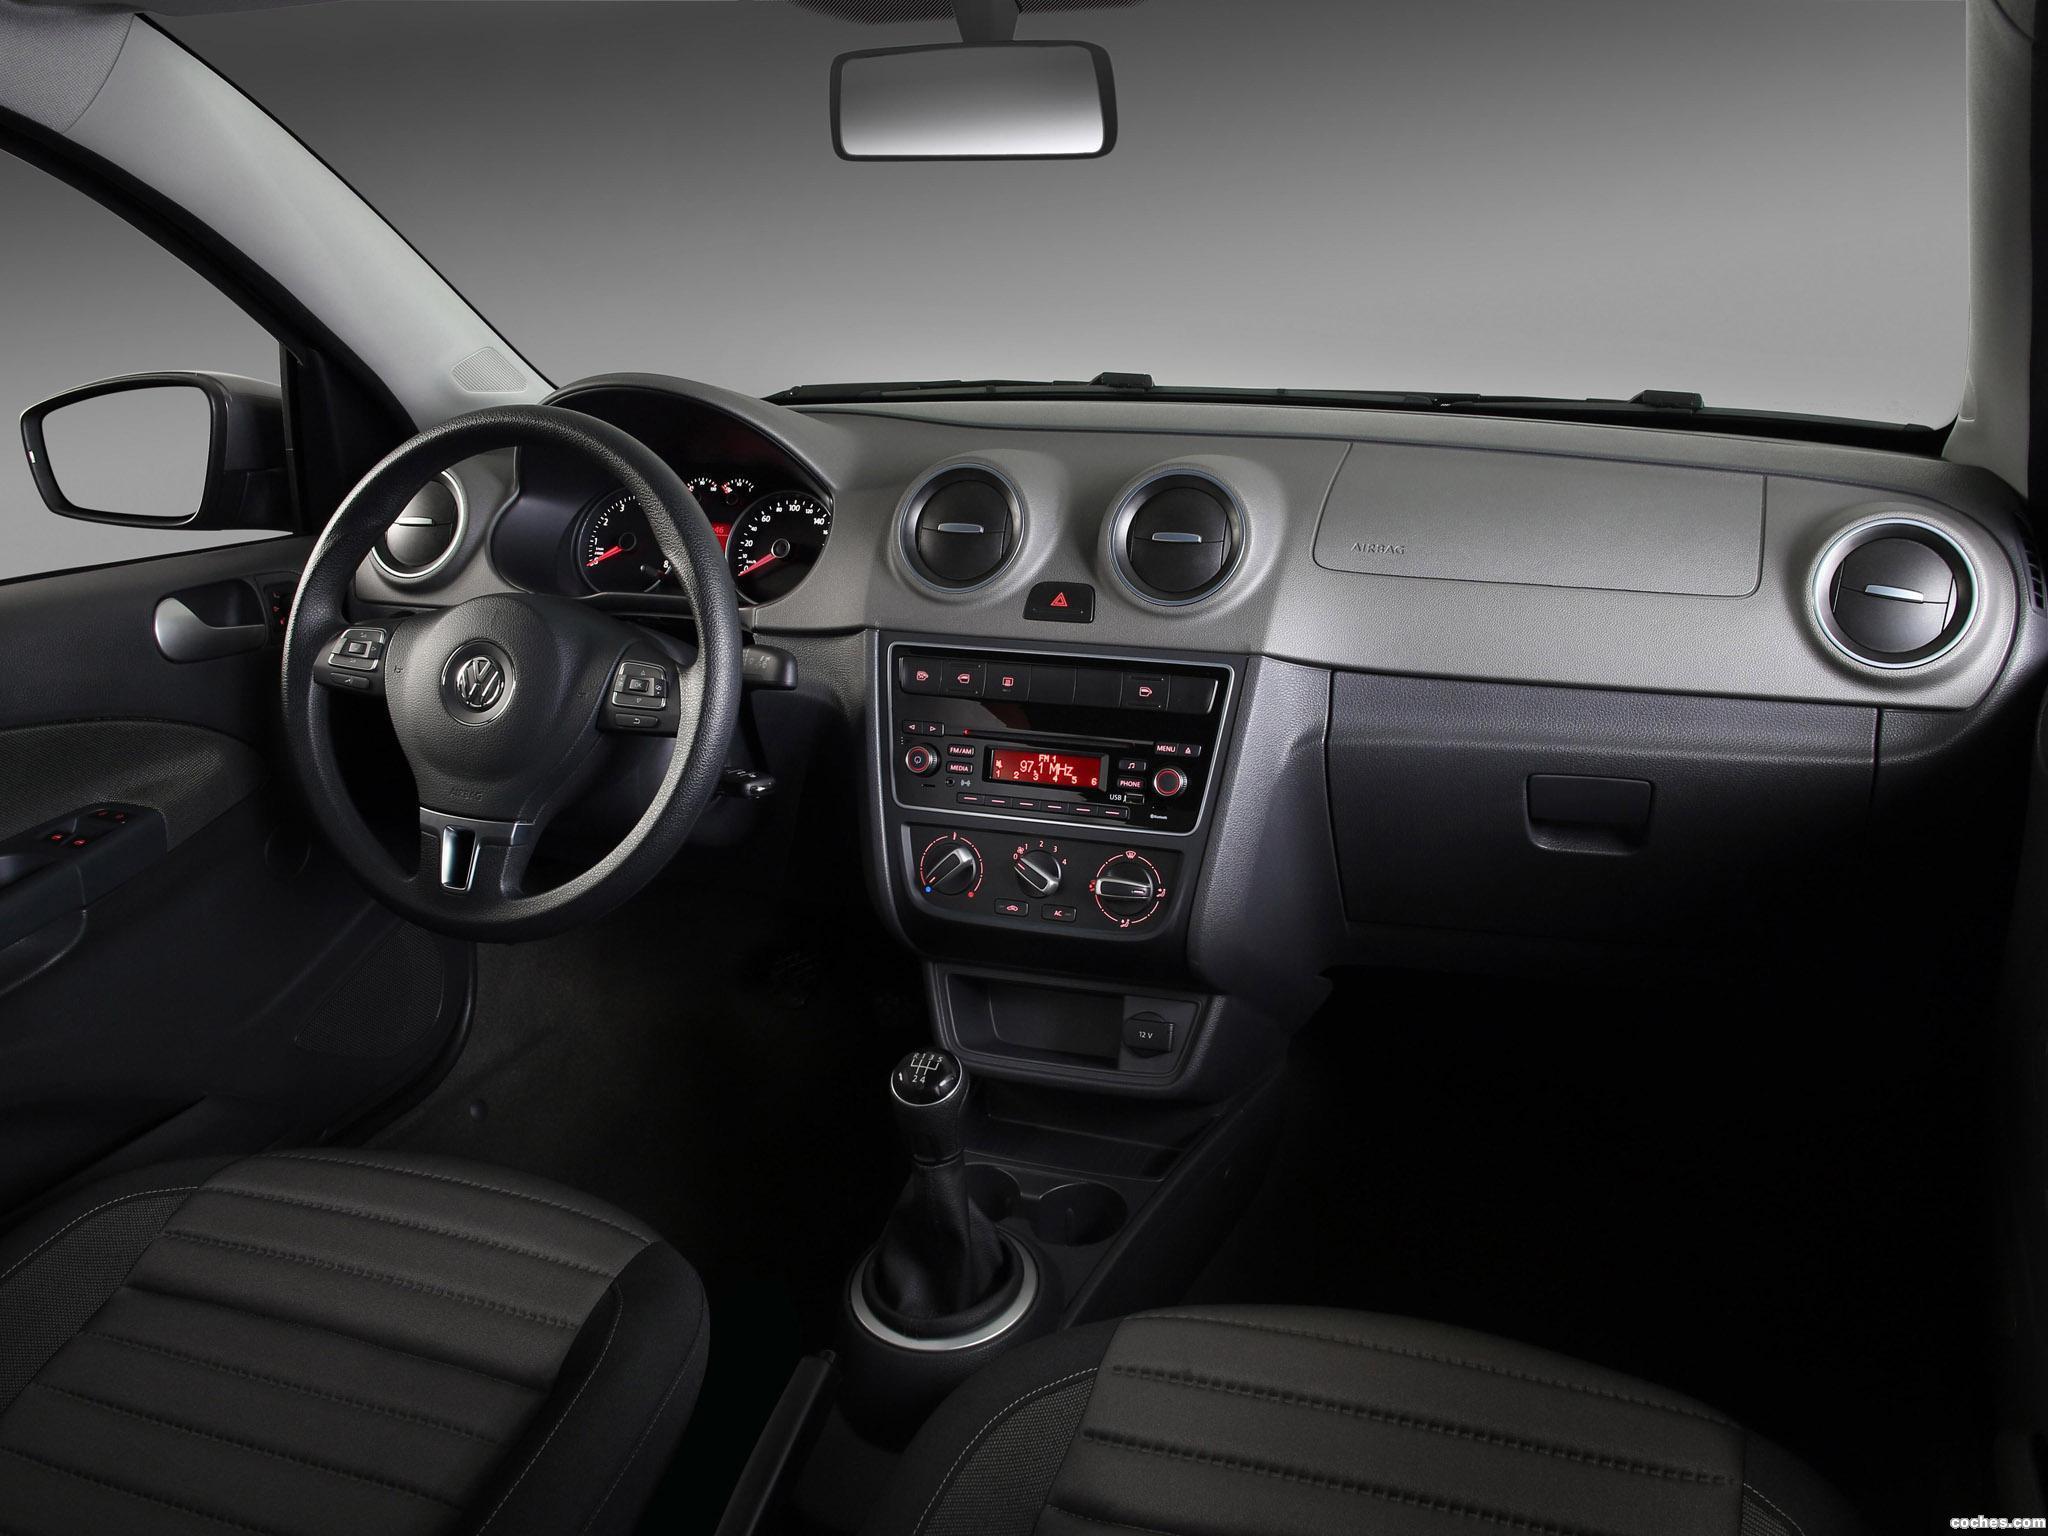 Foto 4 de Volkswagen Gol Bluemotion 2012